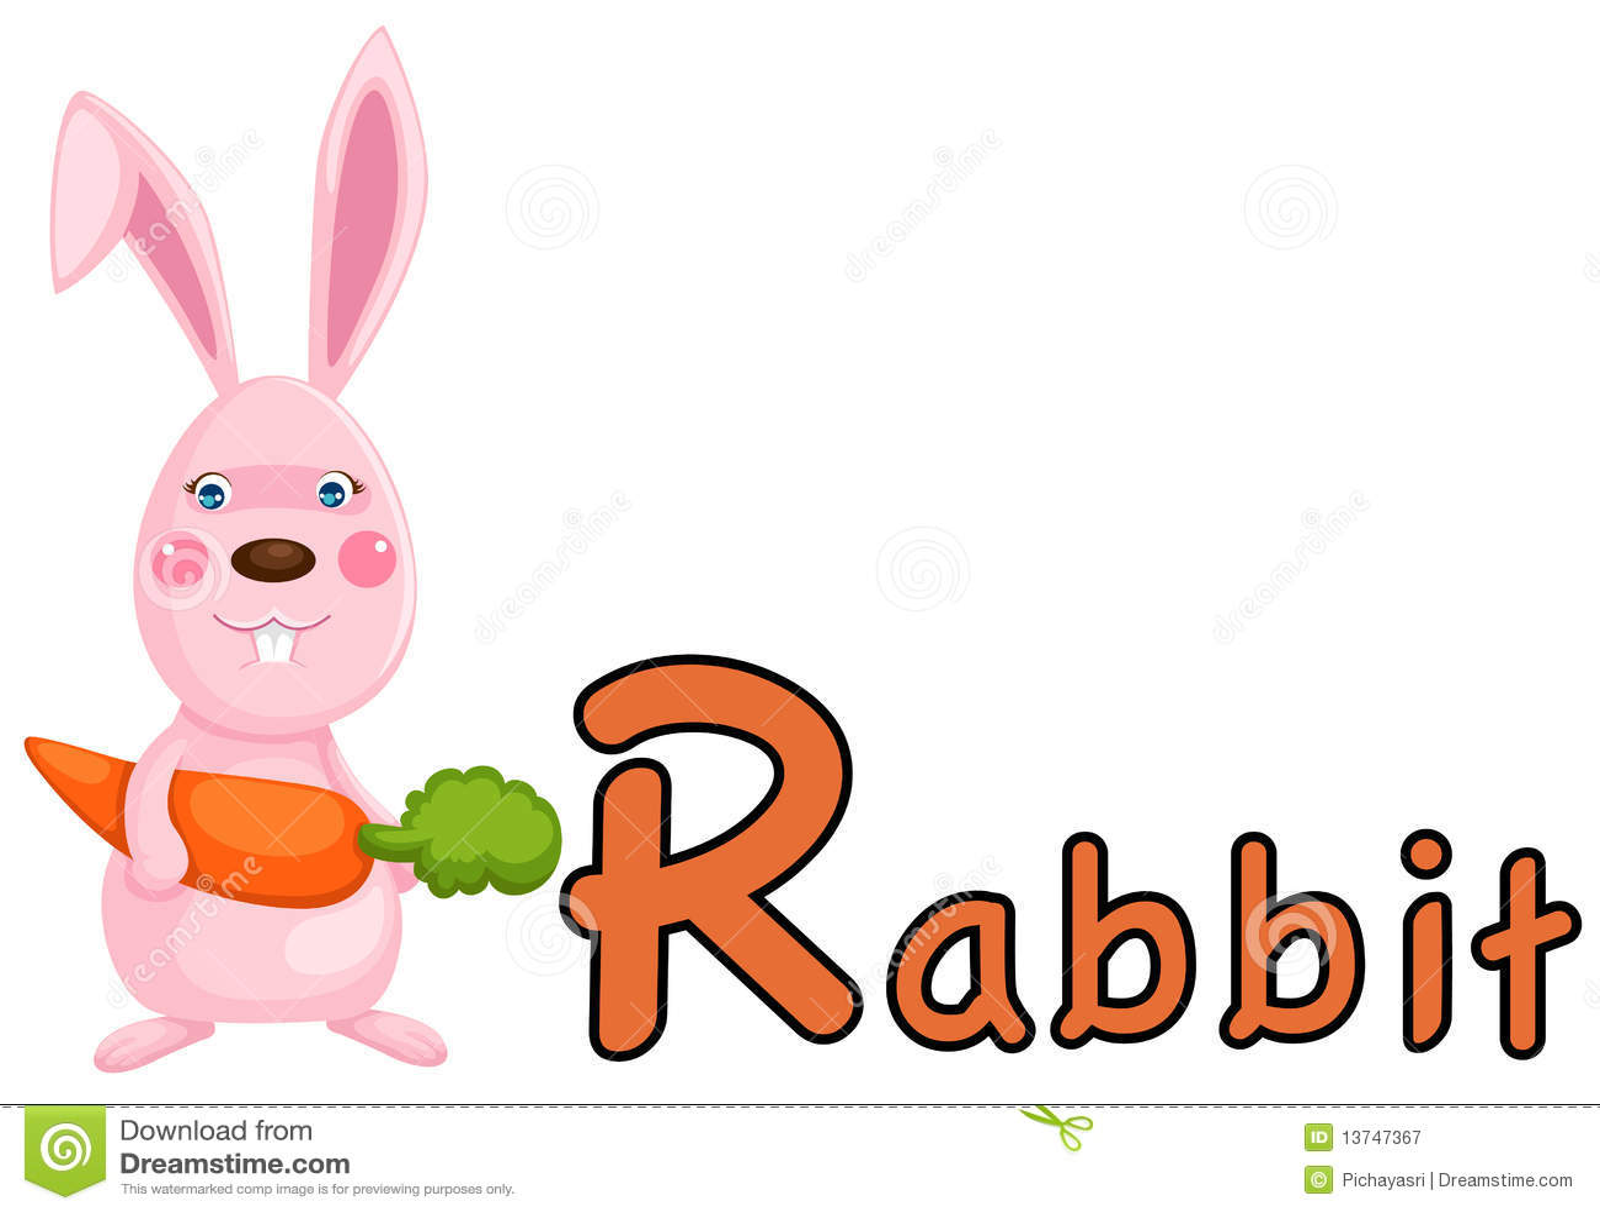 Animal Alphabet R For Rabbit Royalty Free Stock Photography